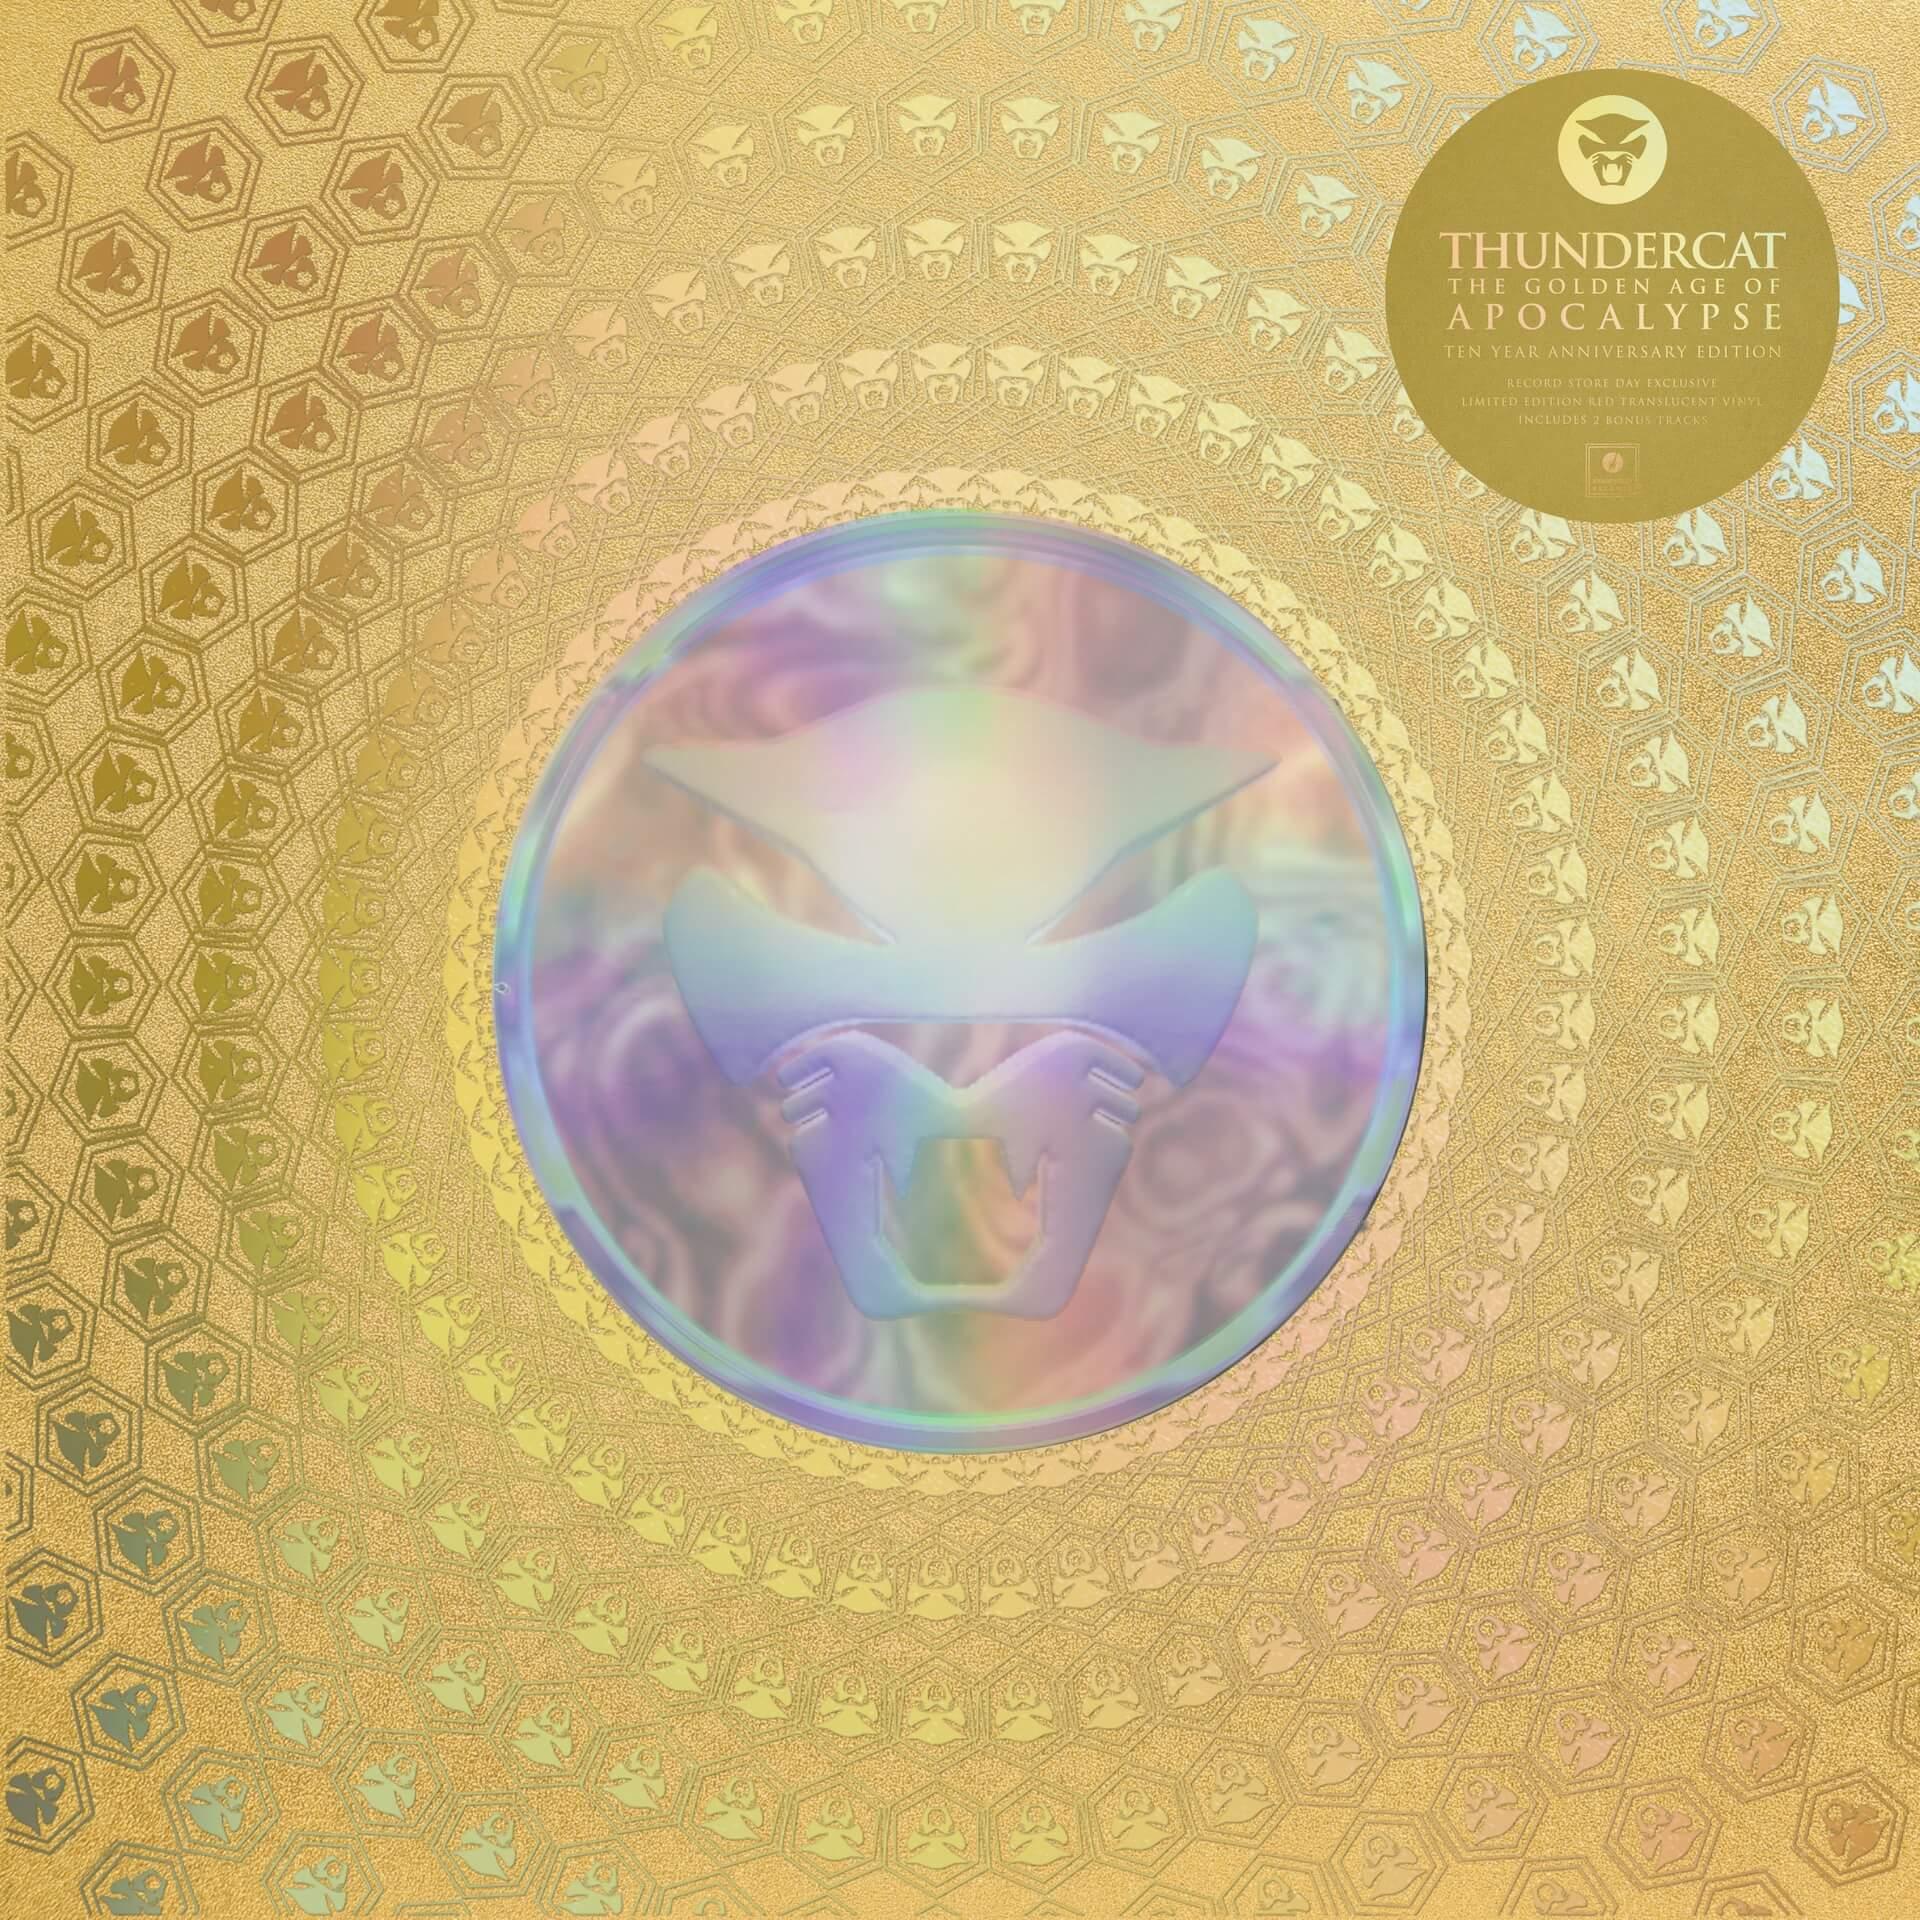 Thundercat『Golden Age of Apocalypse』10周年記念盤がリリース決定!Flying Lotusプロデュースの傑作 music210916_thunder_cat-02